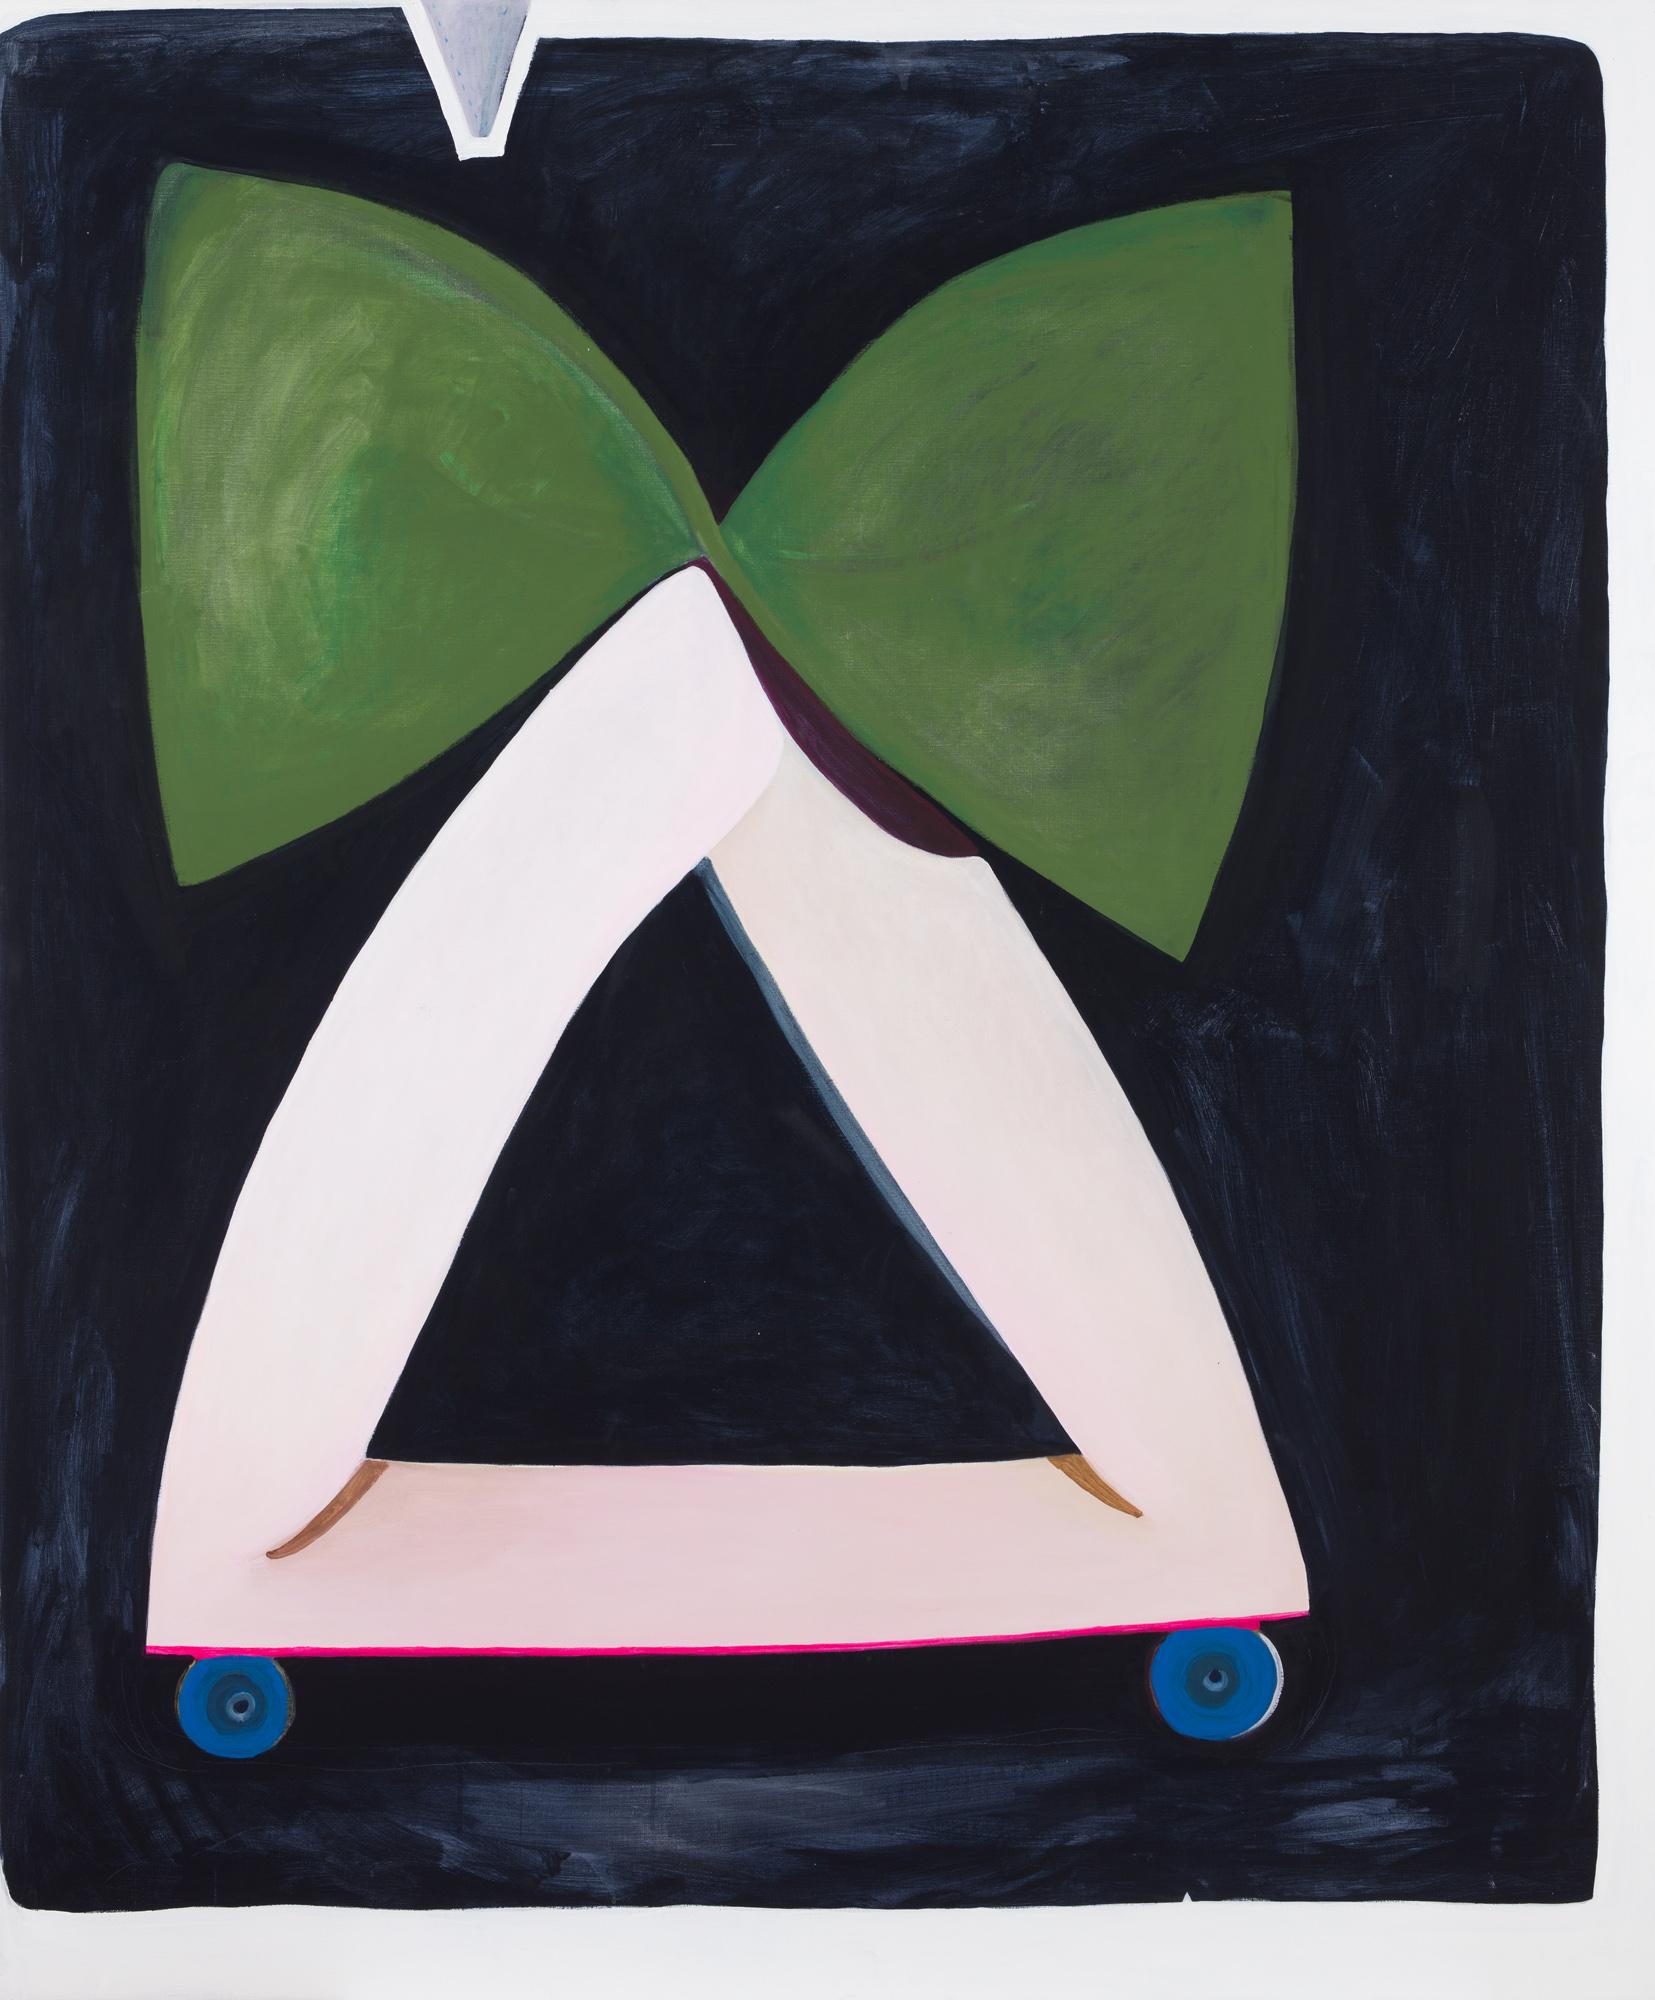 Pia Mauno  Duett med grön rosett  2018 Vinyl paint and oil on canvas 175 x 145 cm